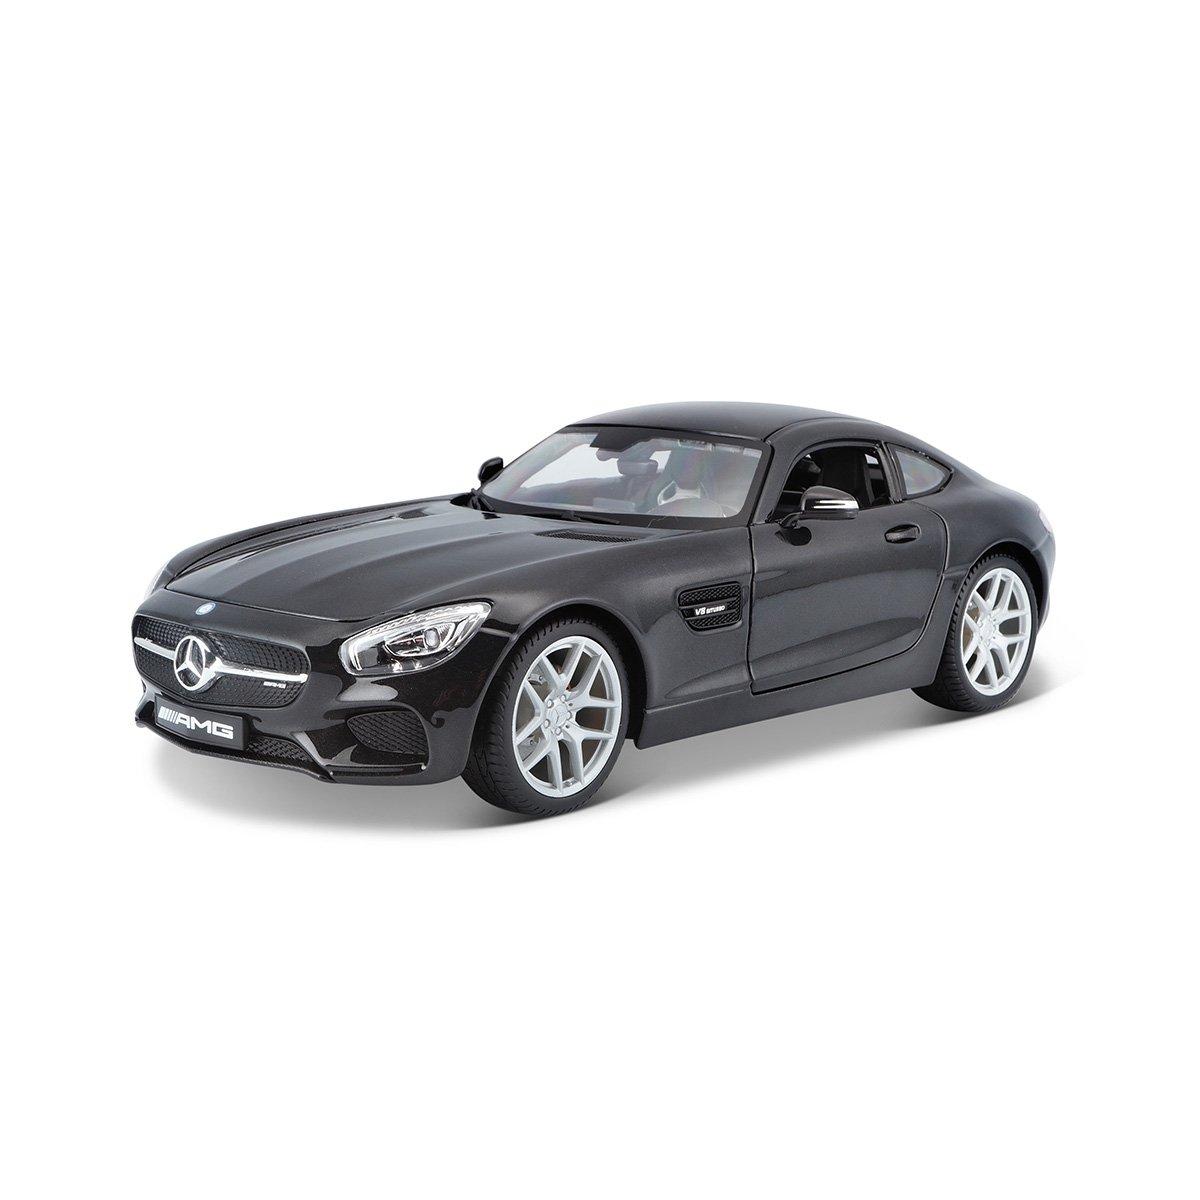 Masinuta Maisto Mercedes AMG GT. 1:18. Negru